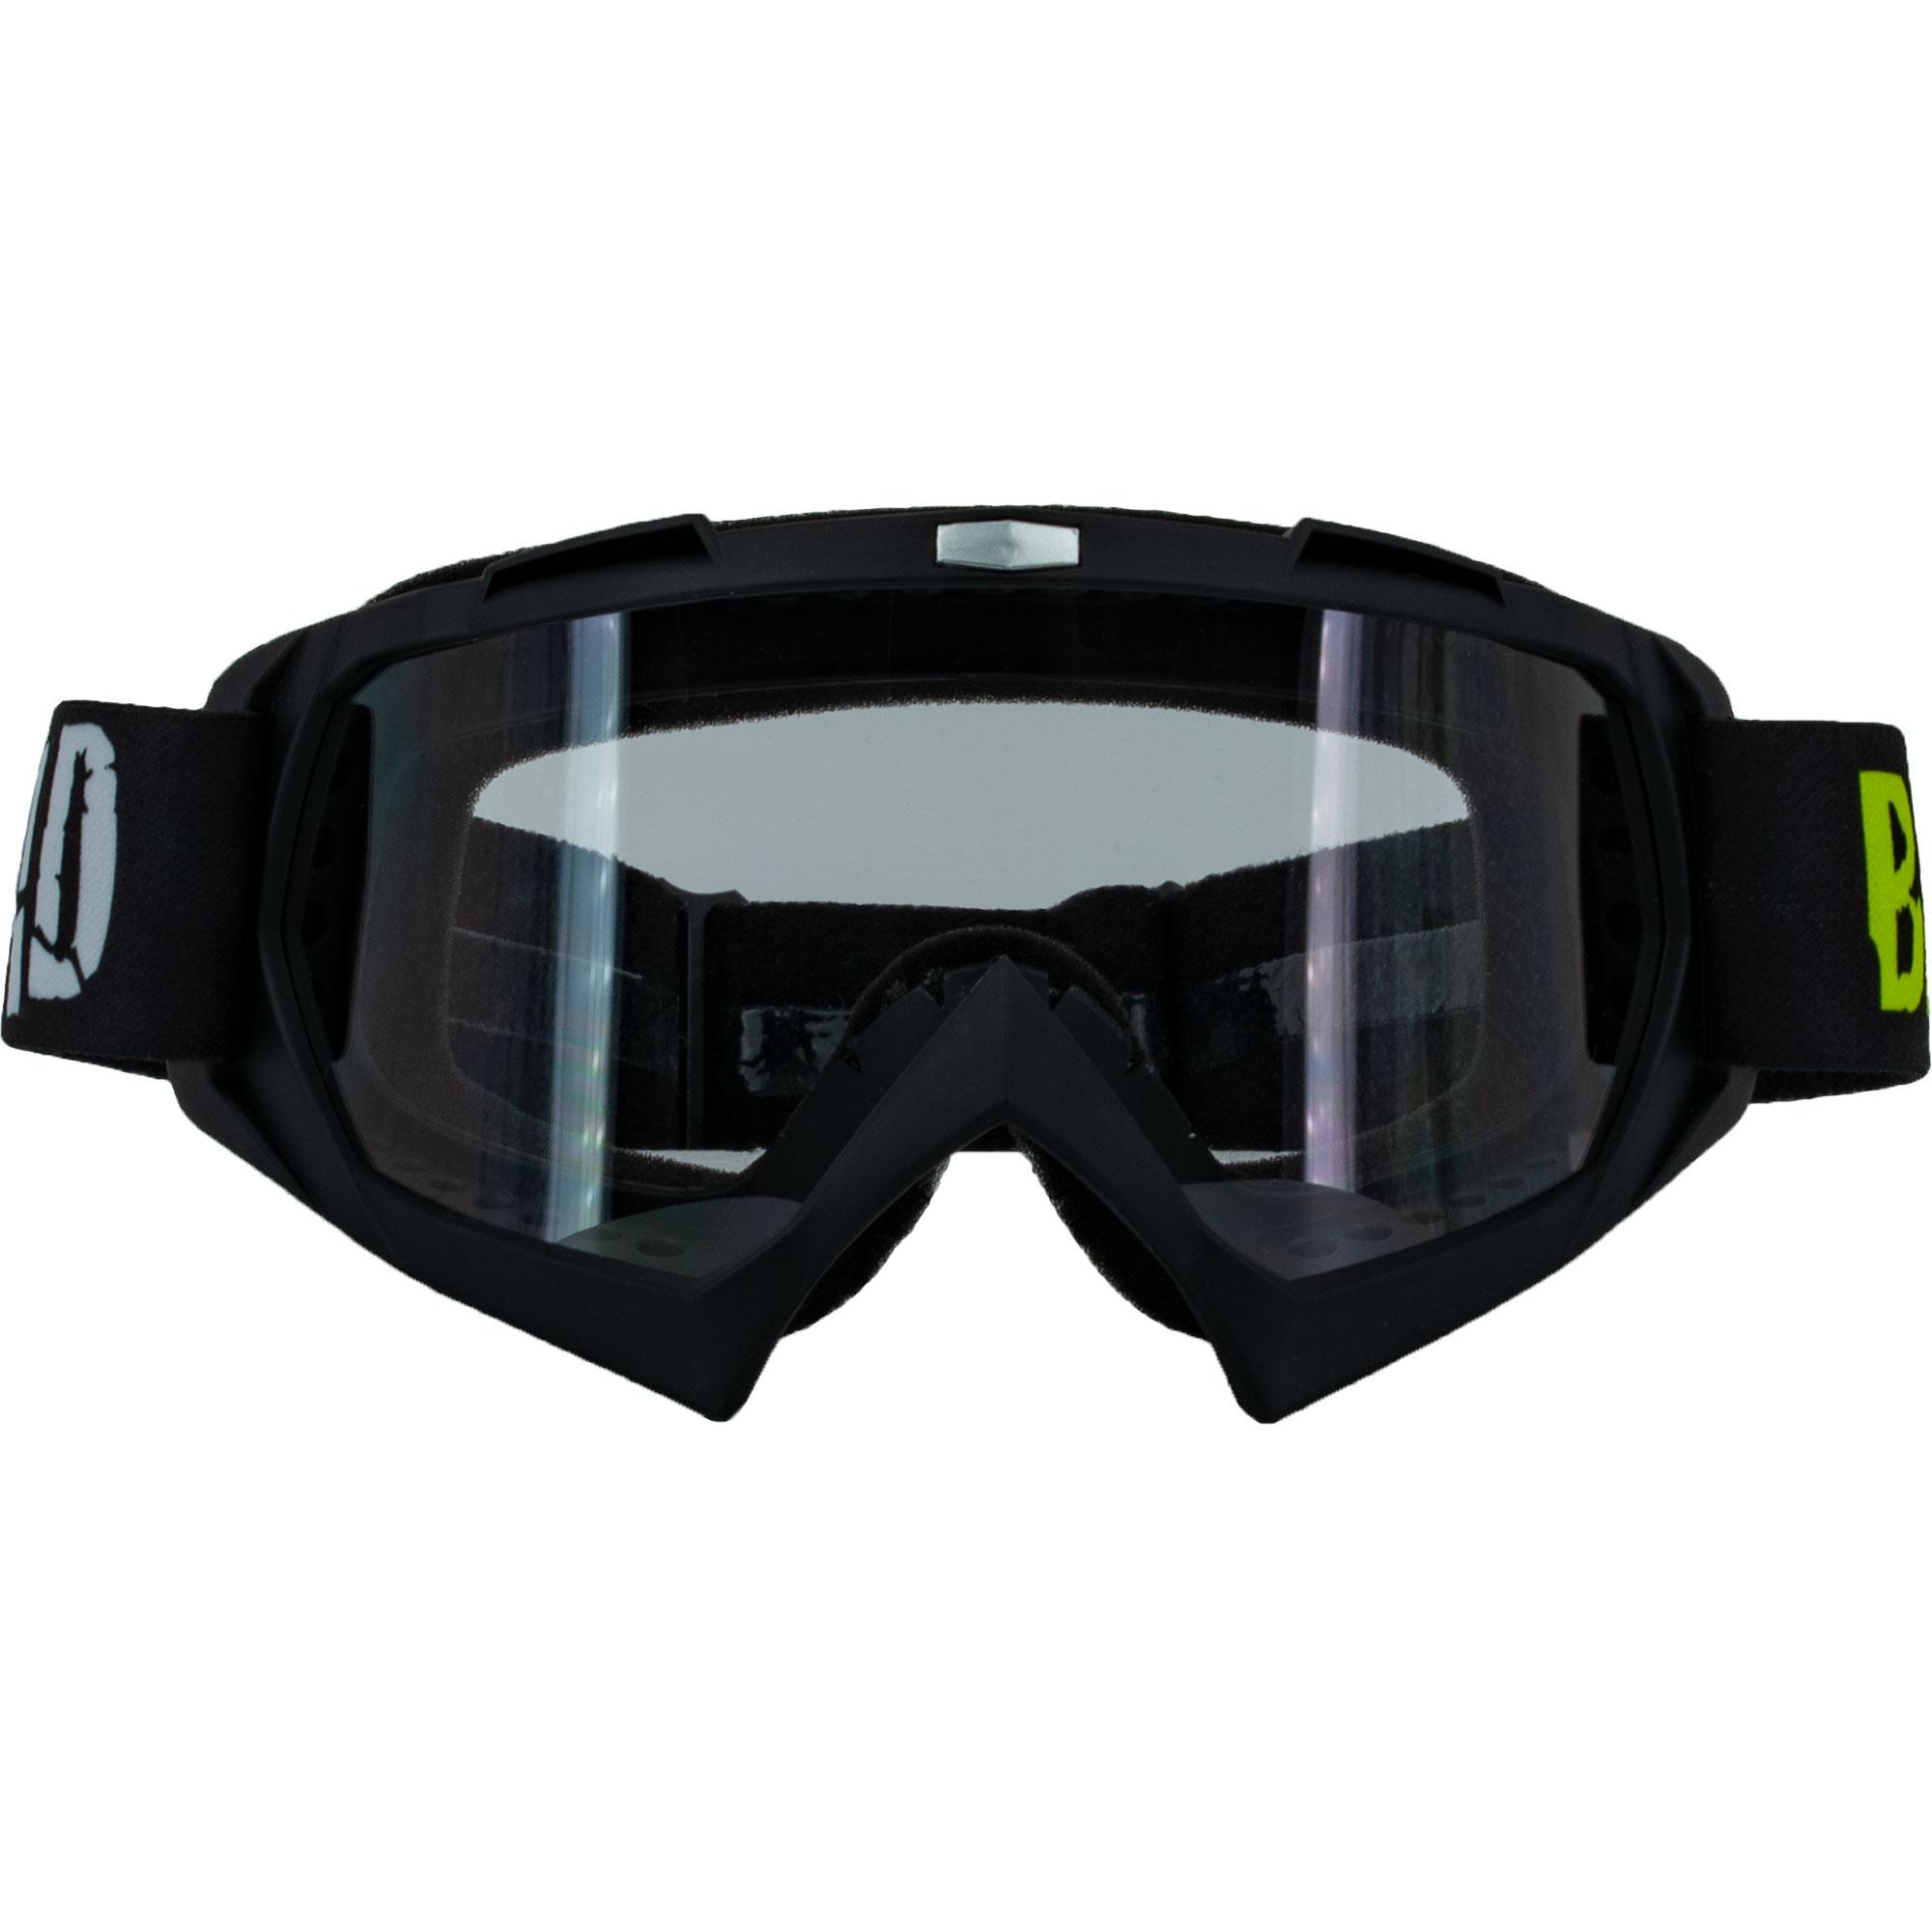 Offroad Broken Head MX-2 Goggle Rot Enduro Downhill Mit UV-Schutz Motorrad-Brille F/ür Motocross